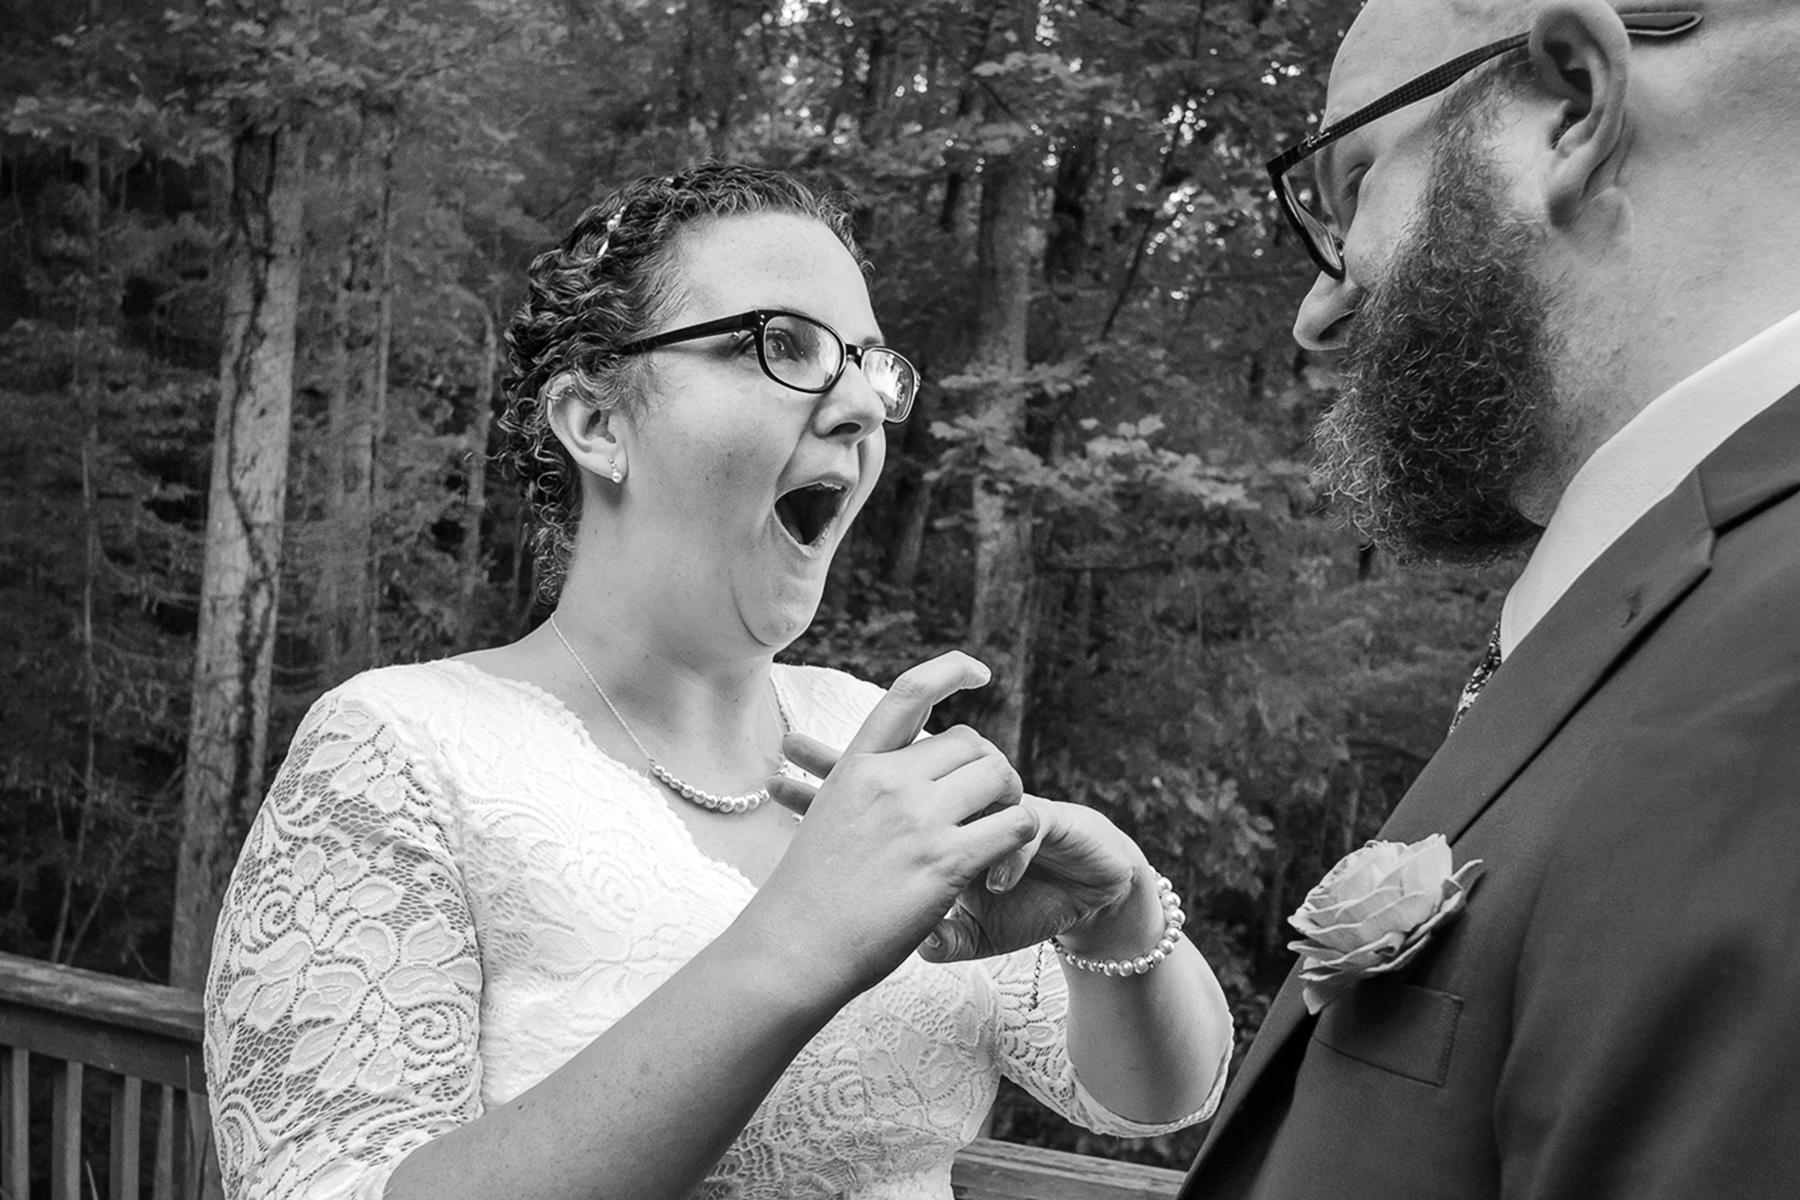 Atlanta, GA Wedding Image | the bride reacts after reading the ring inscription